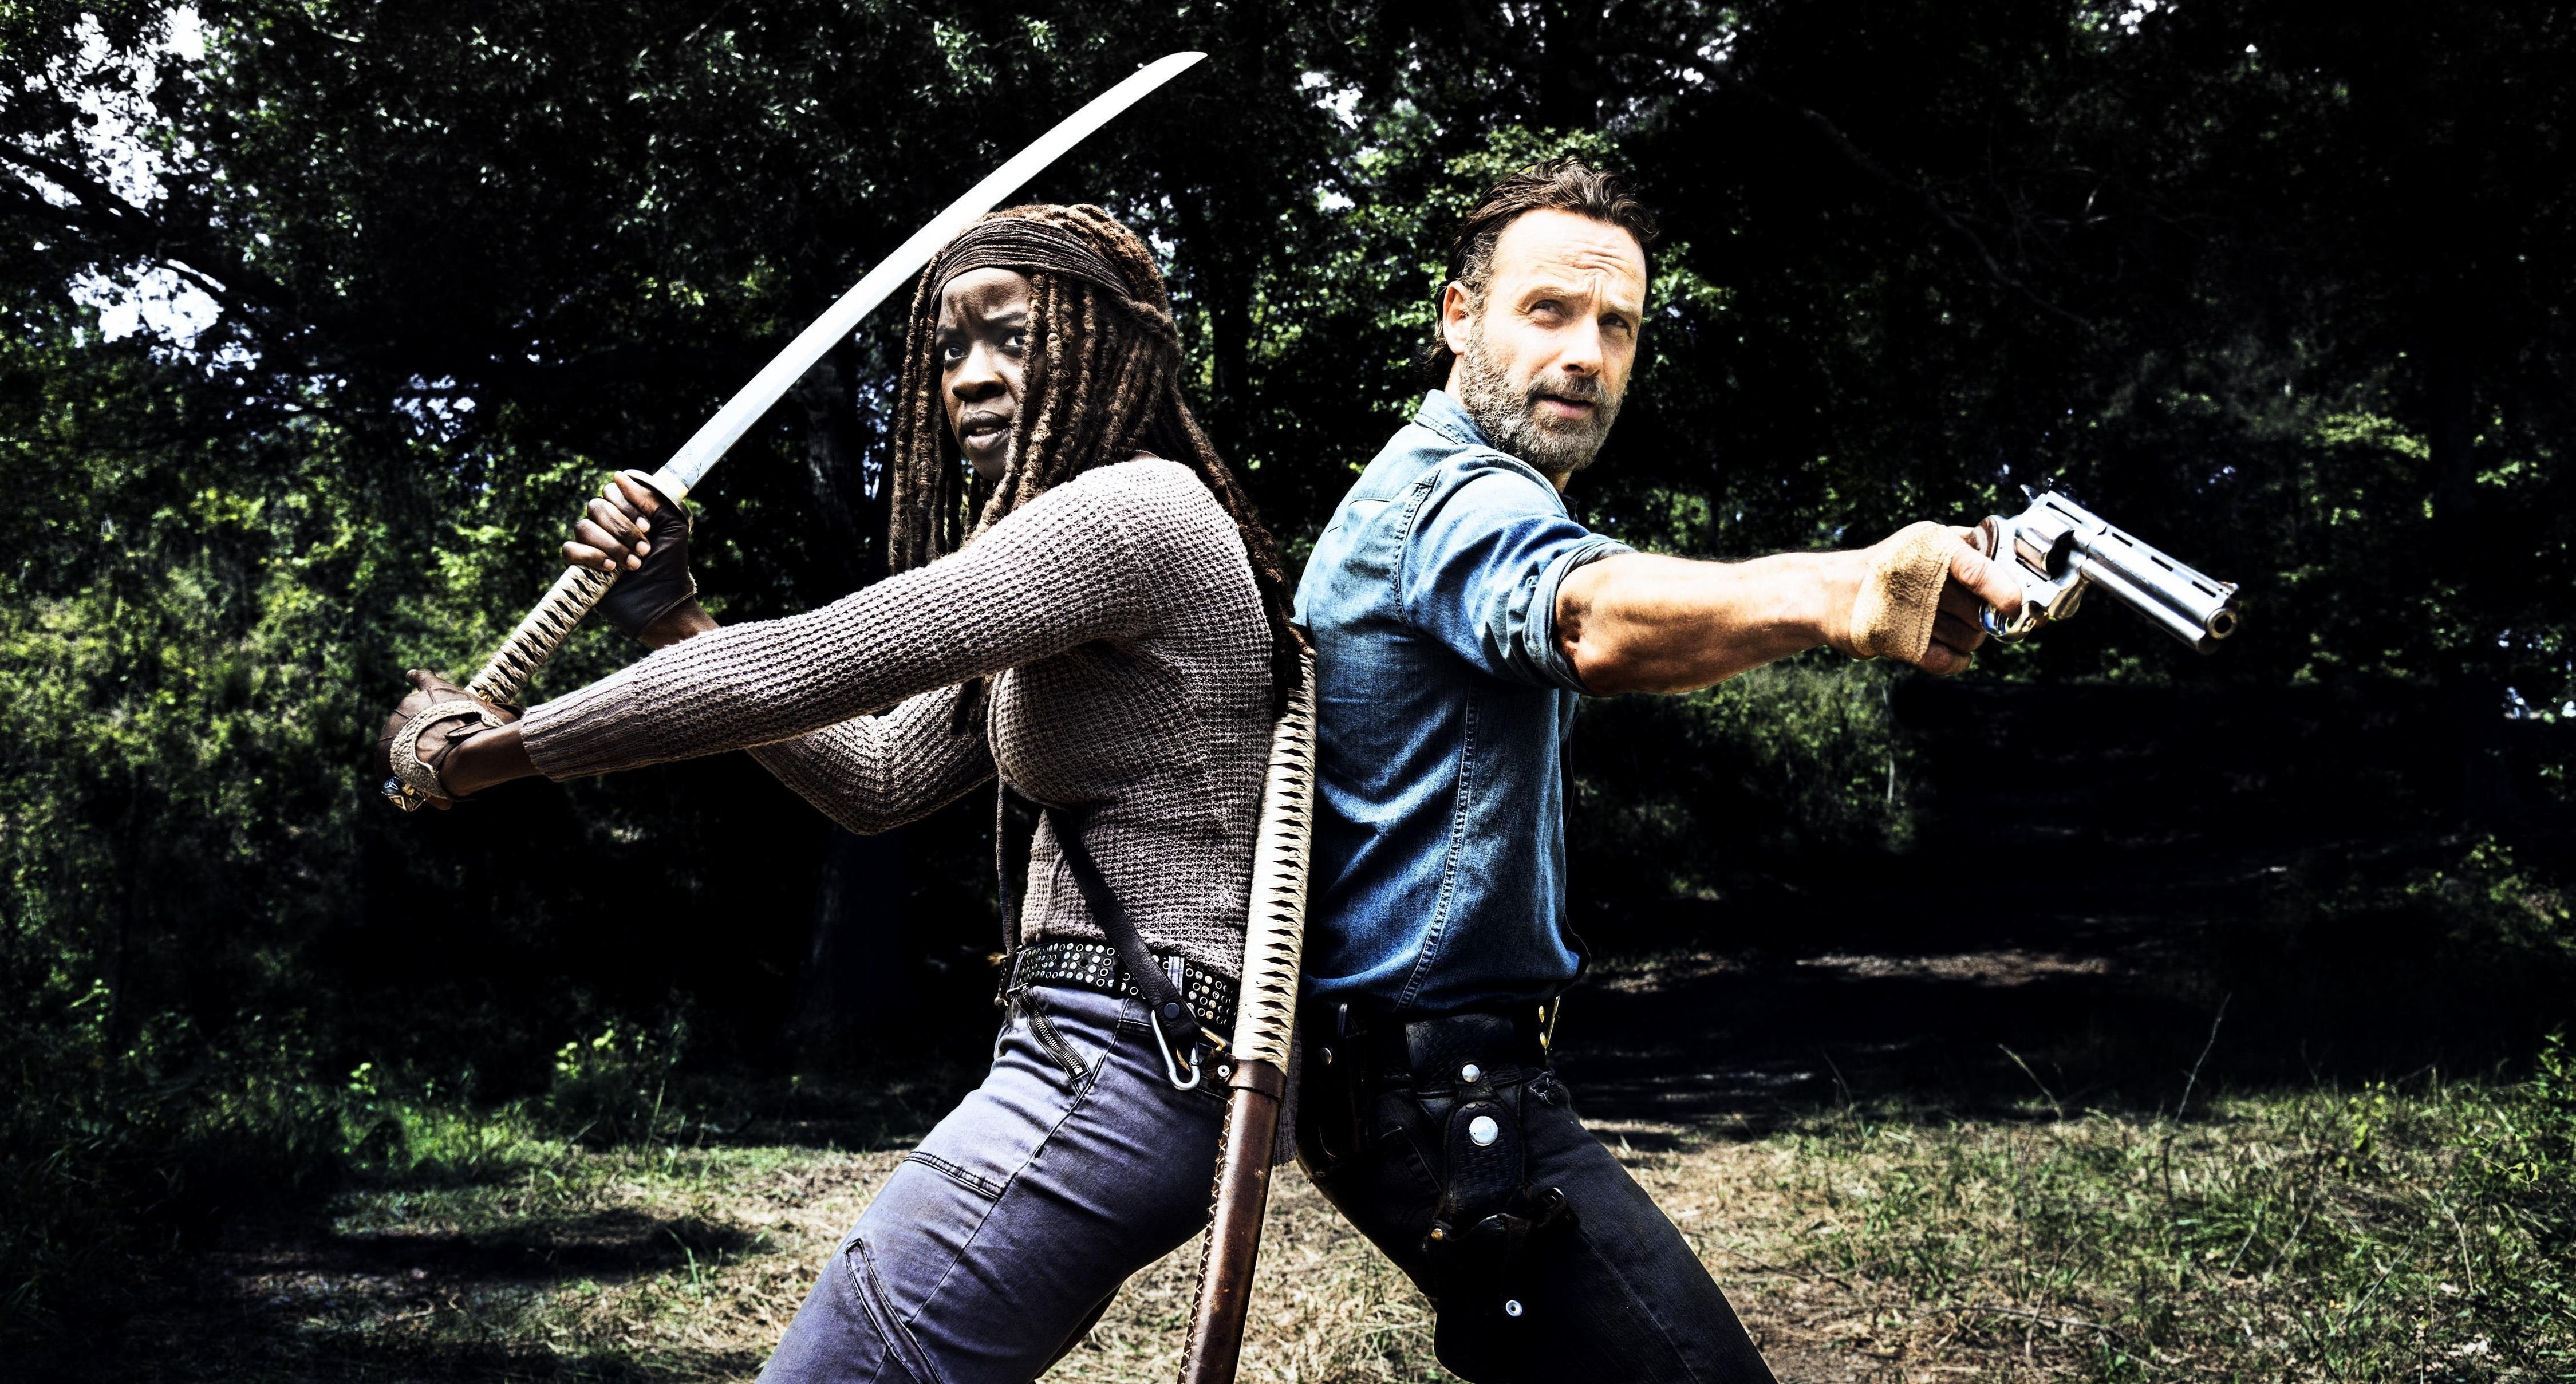 Wallpaper The Walking Dead Rick Grimes Michonne 4499x2417